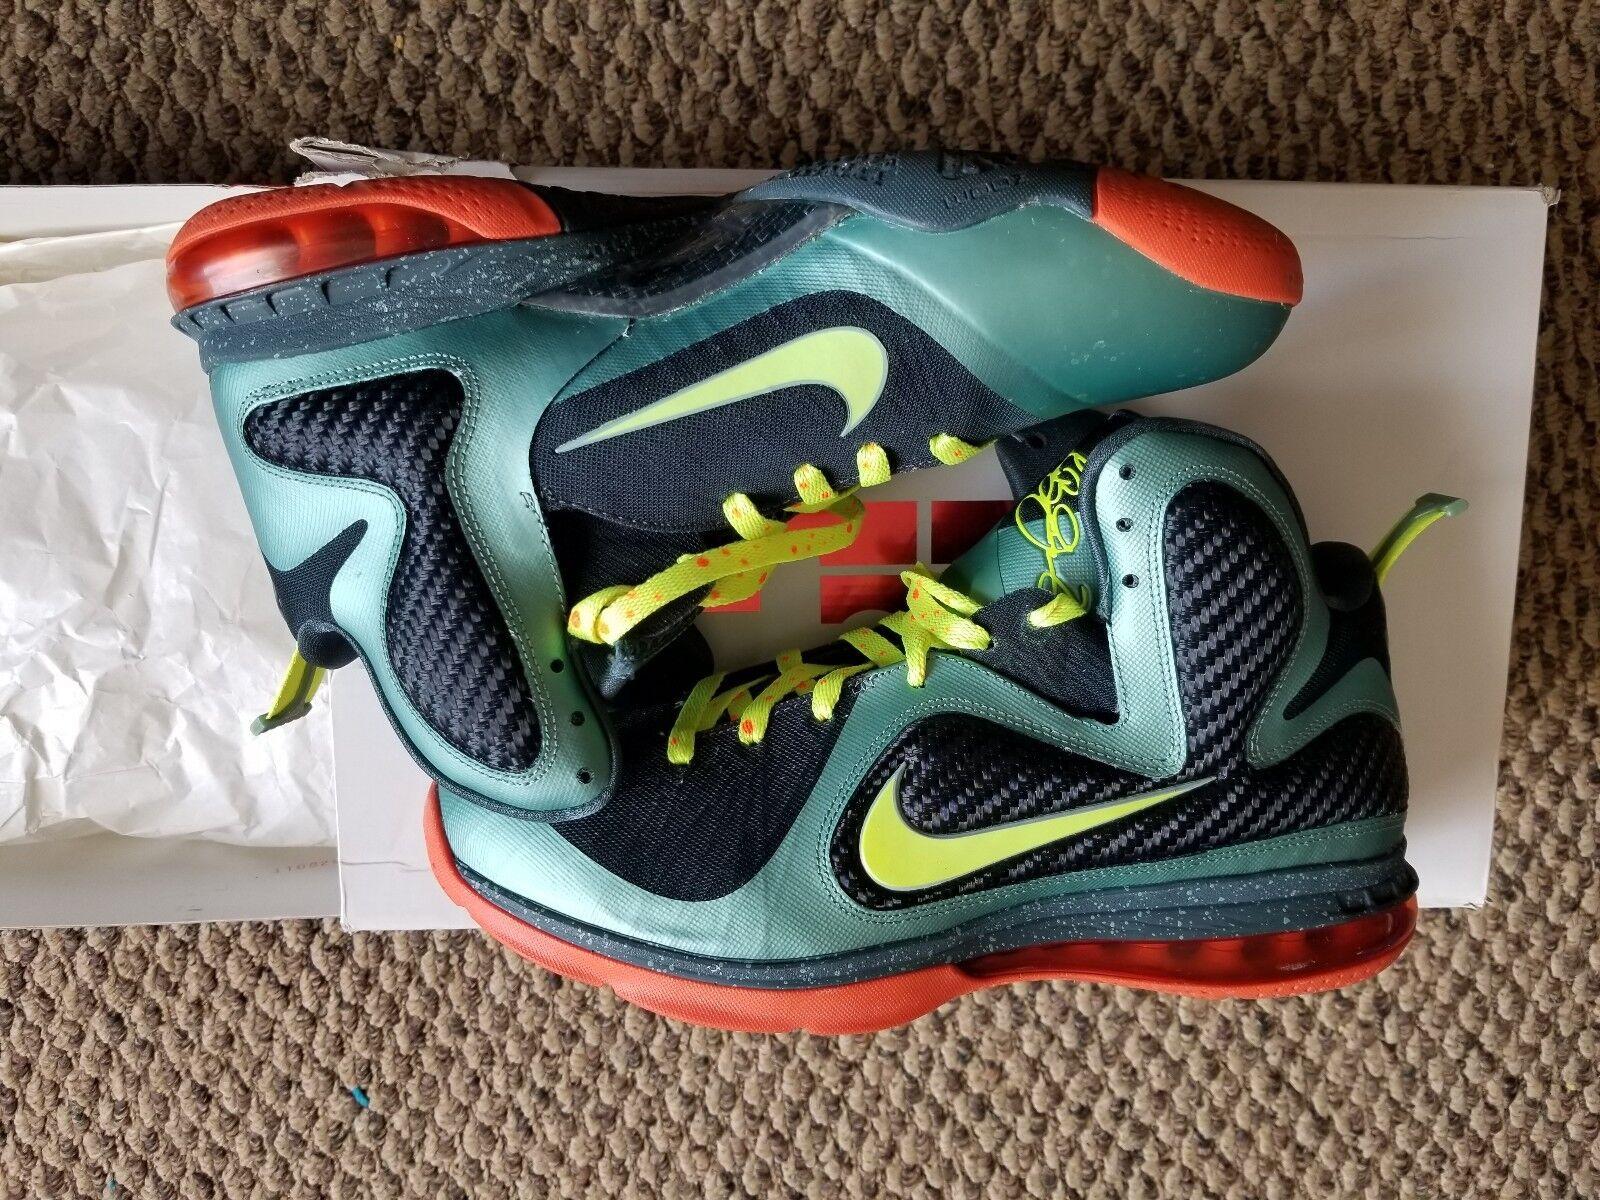 Nike uomini lebron 9 cannoni - misura noi